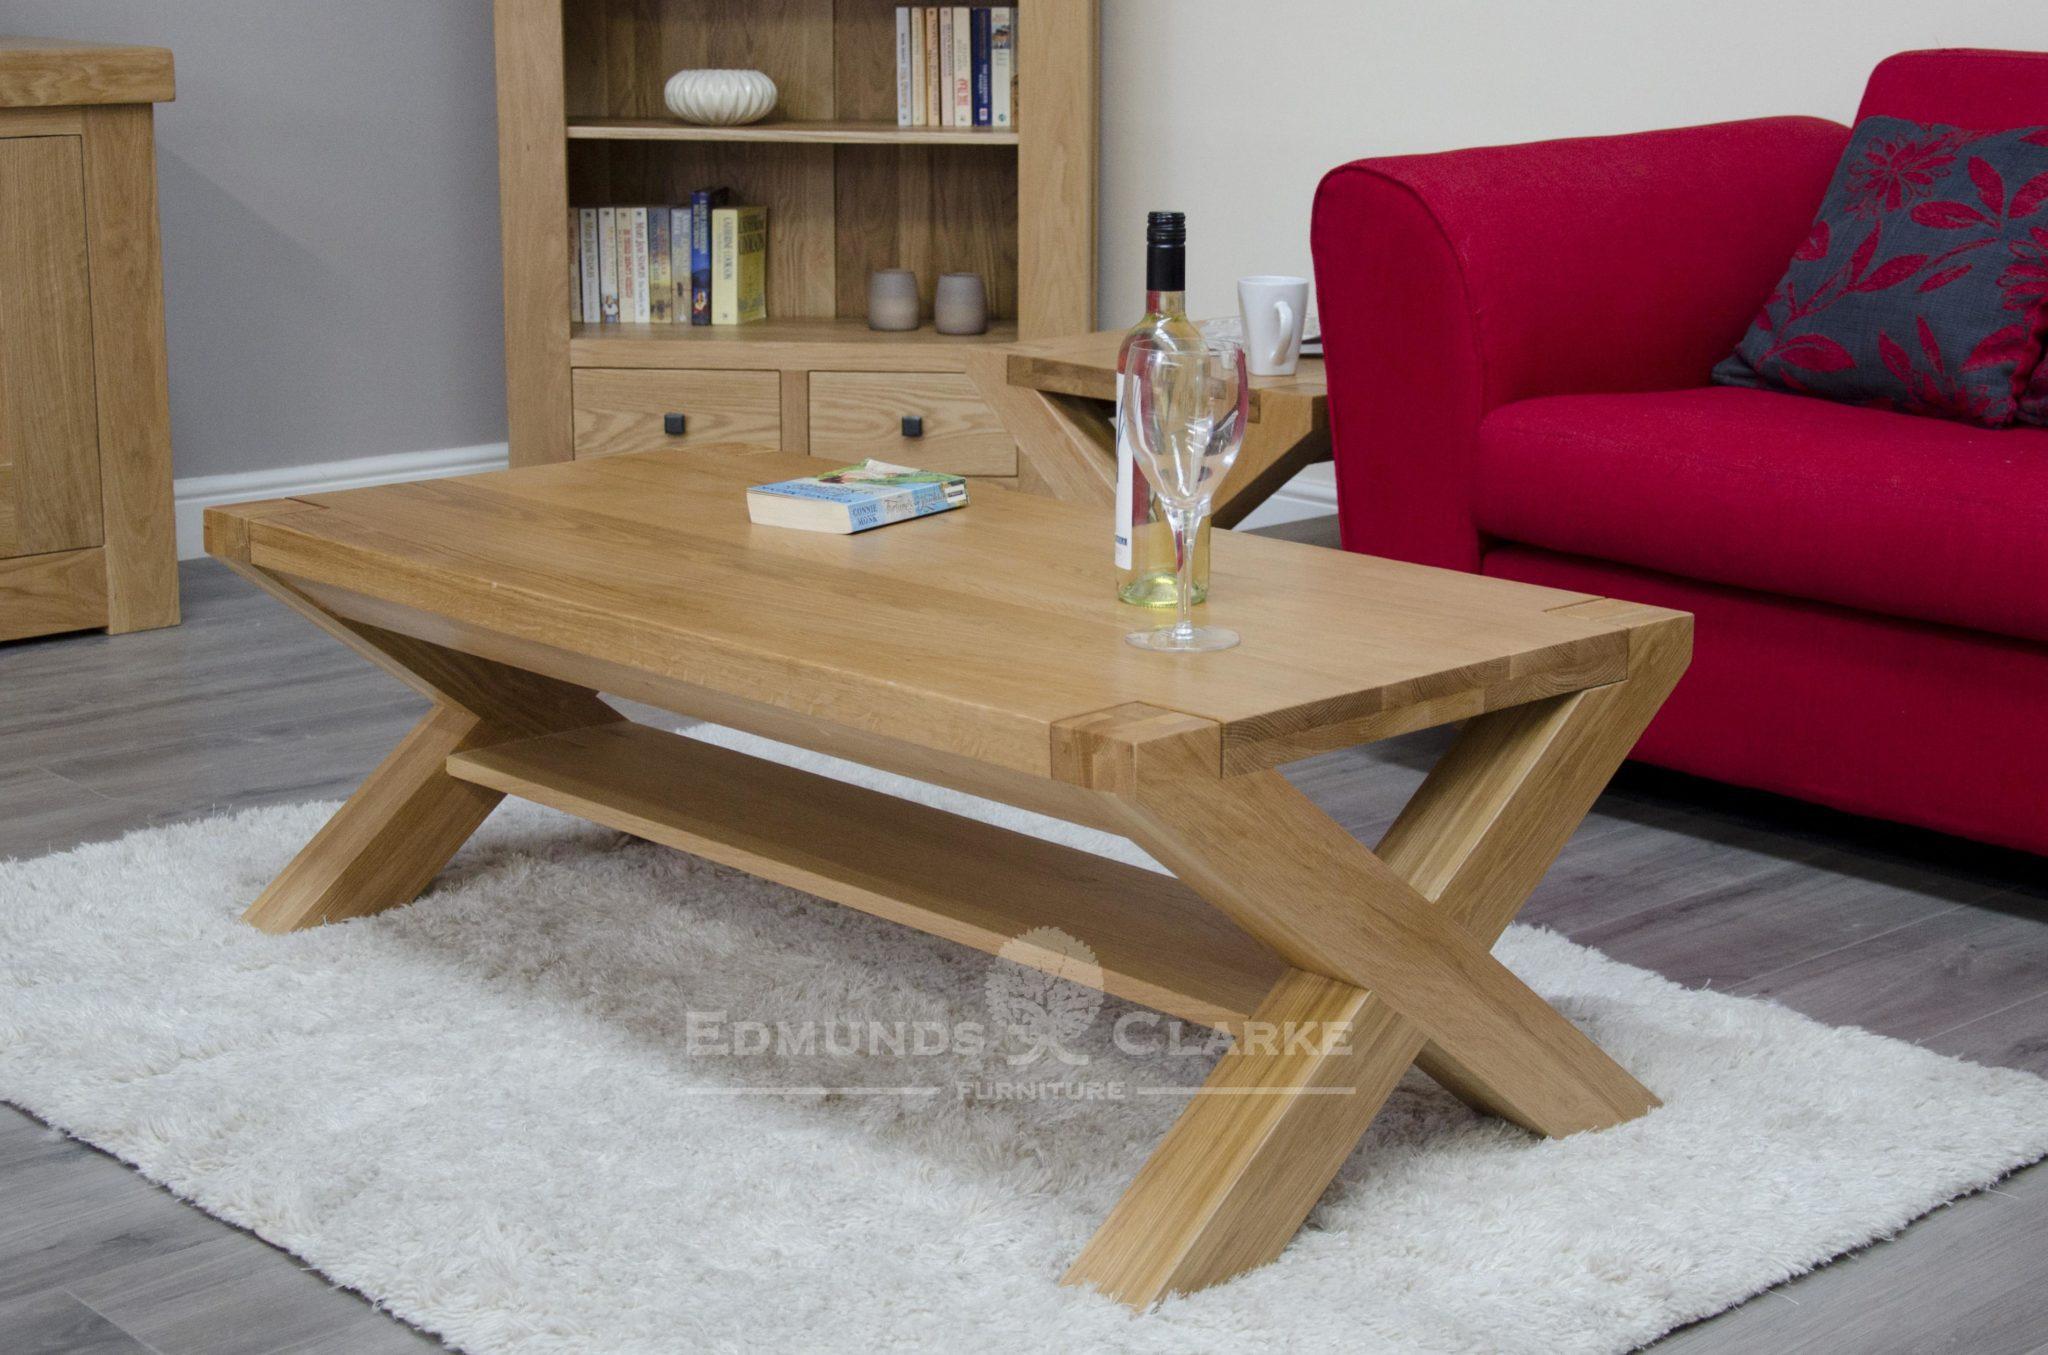 Newmarket solid oak 4' x 2' coffee table cross leg design